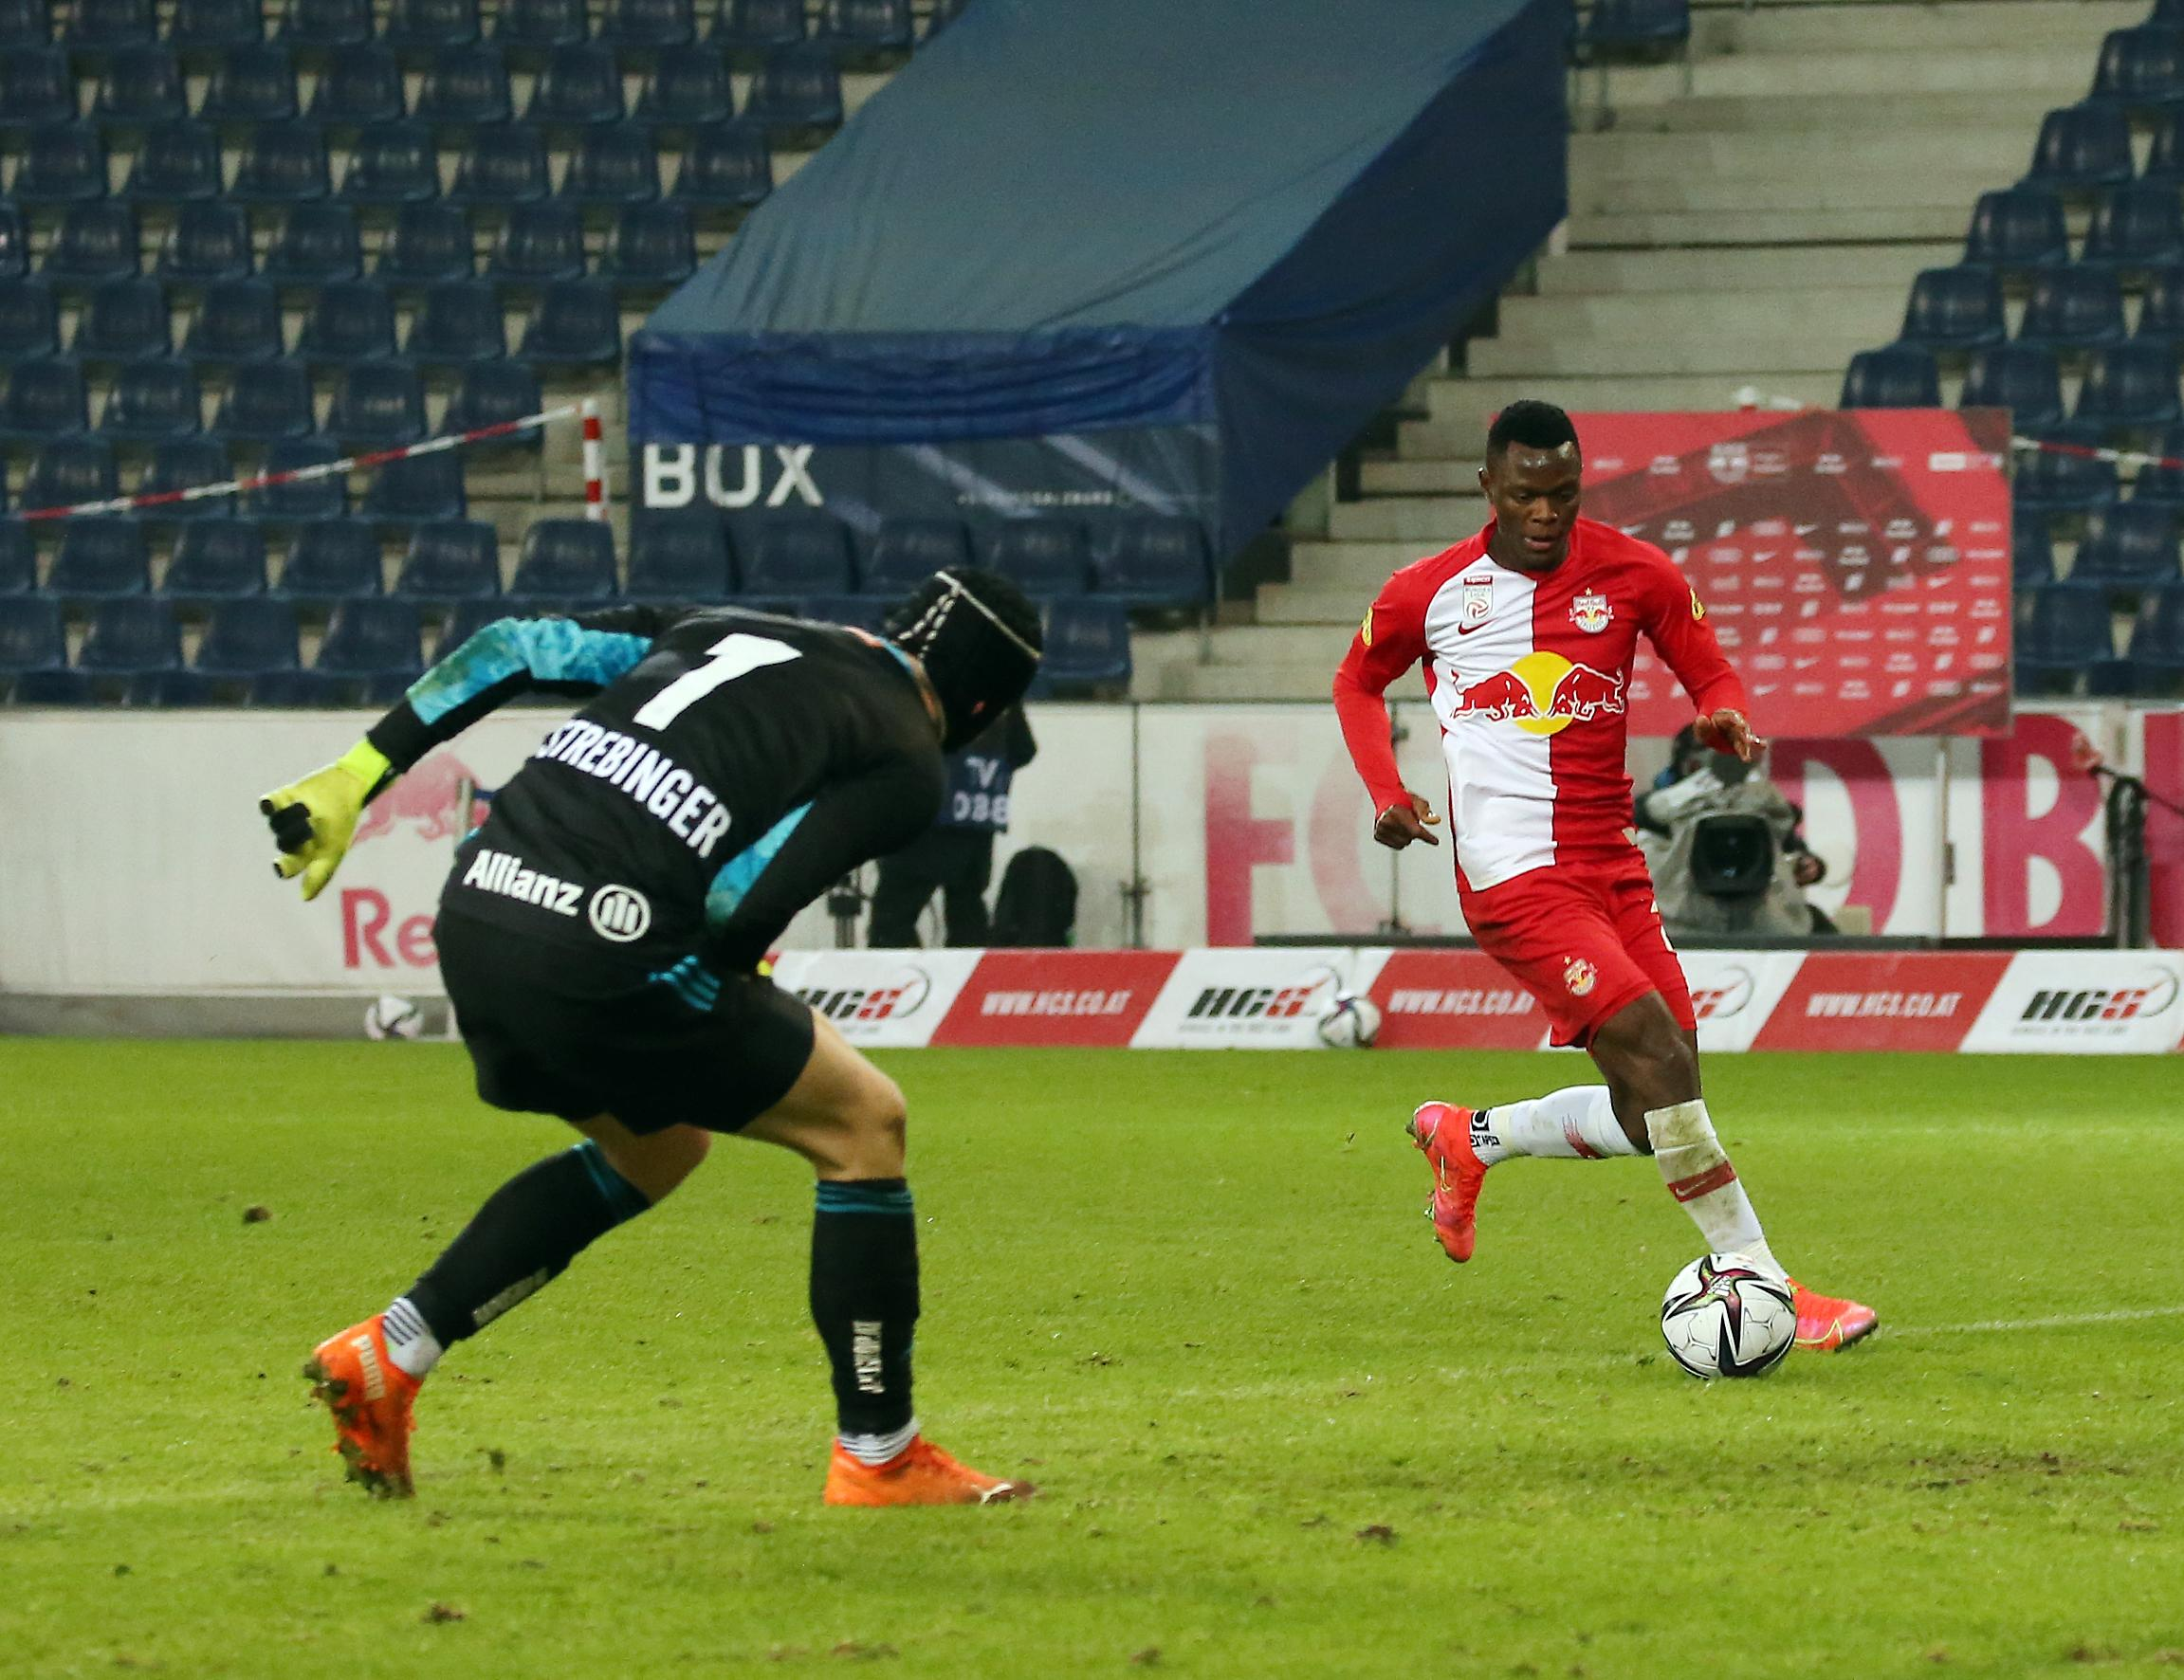 FUSSBALL: TIPICO BUNDESLIGA/GRUNDDURCHGANG: RED BULL SALZBURG - SK RAPID WIEN